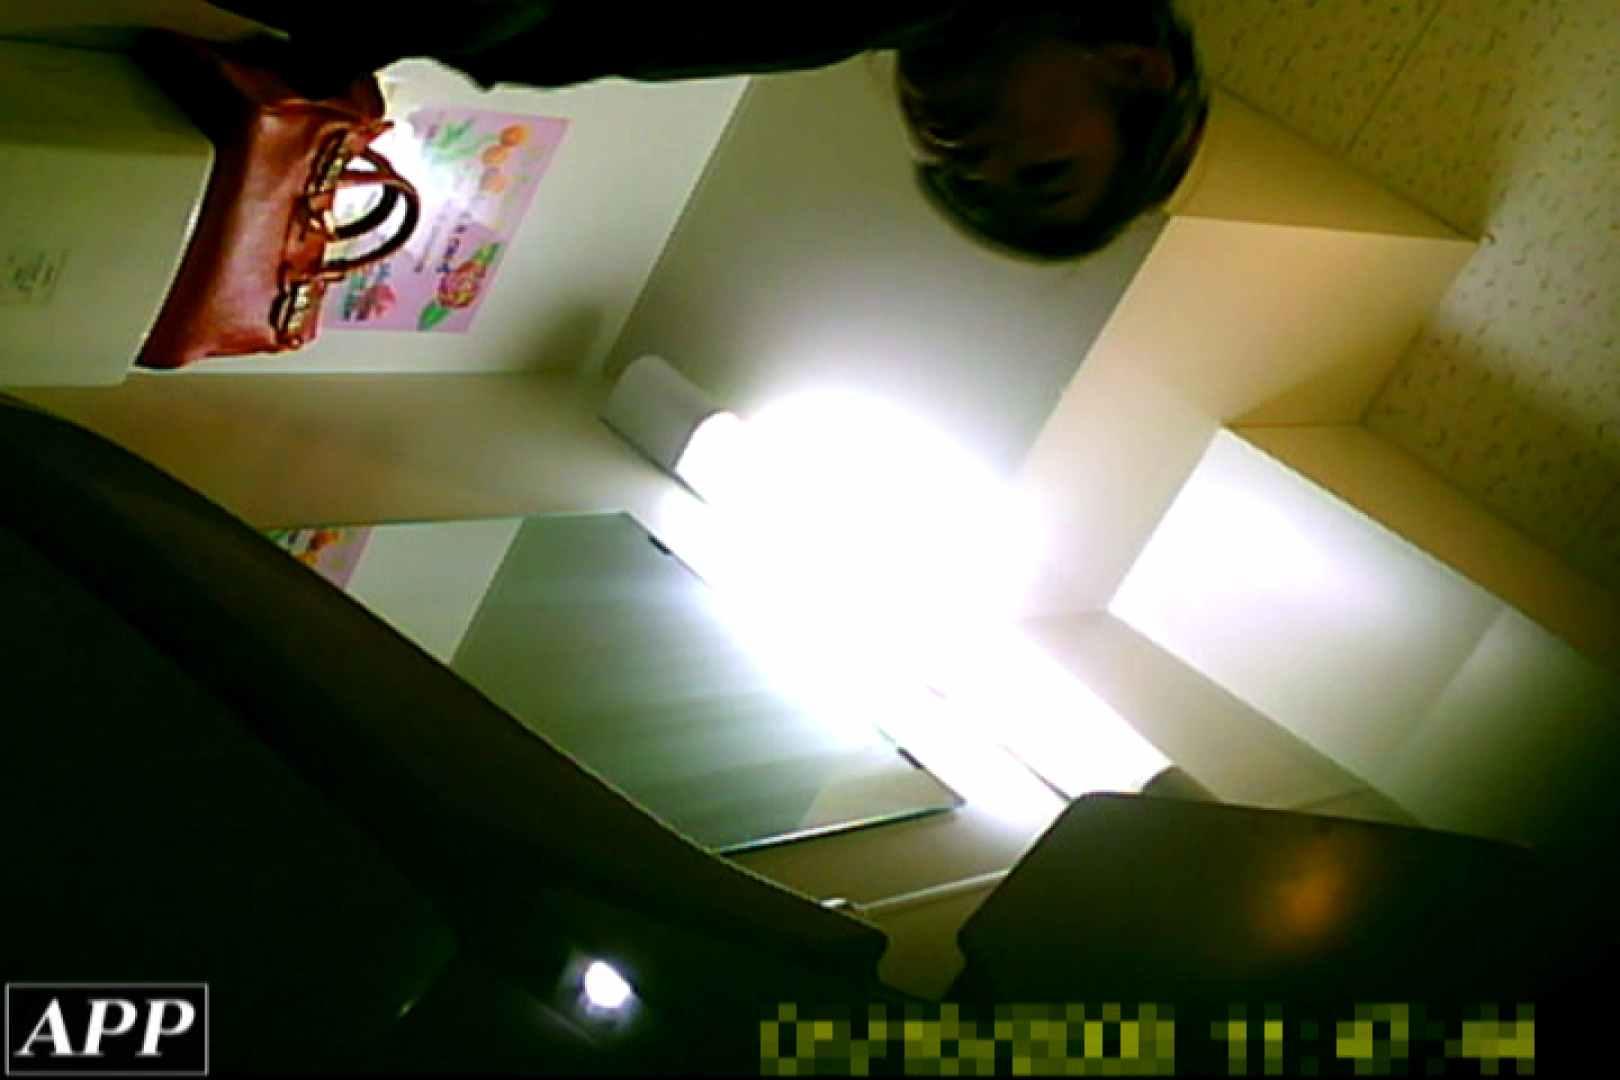 3視点洗面所 vol.127 OLハメ撮り  22Pix 15